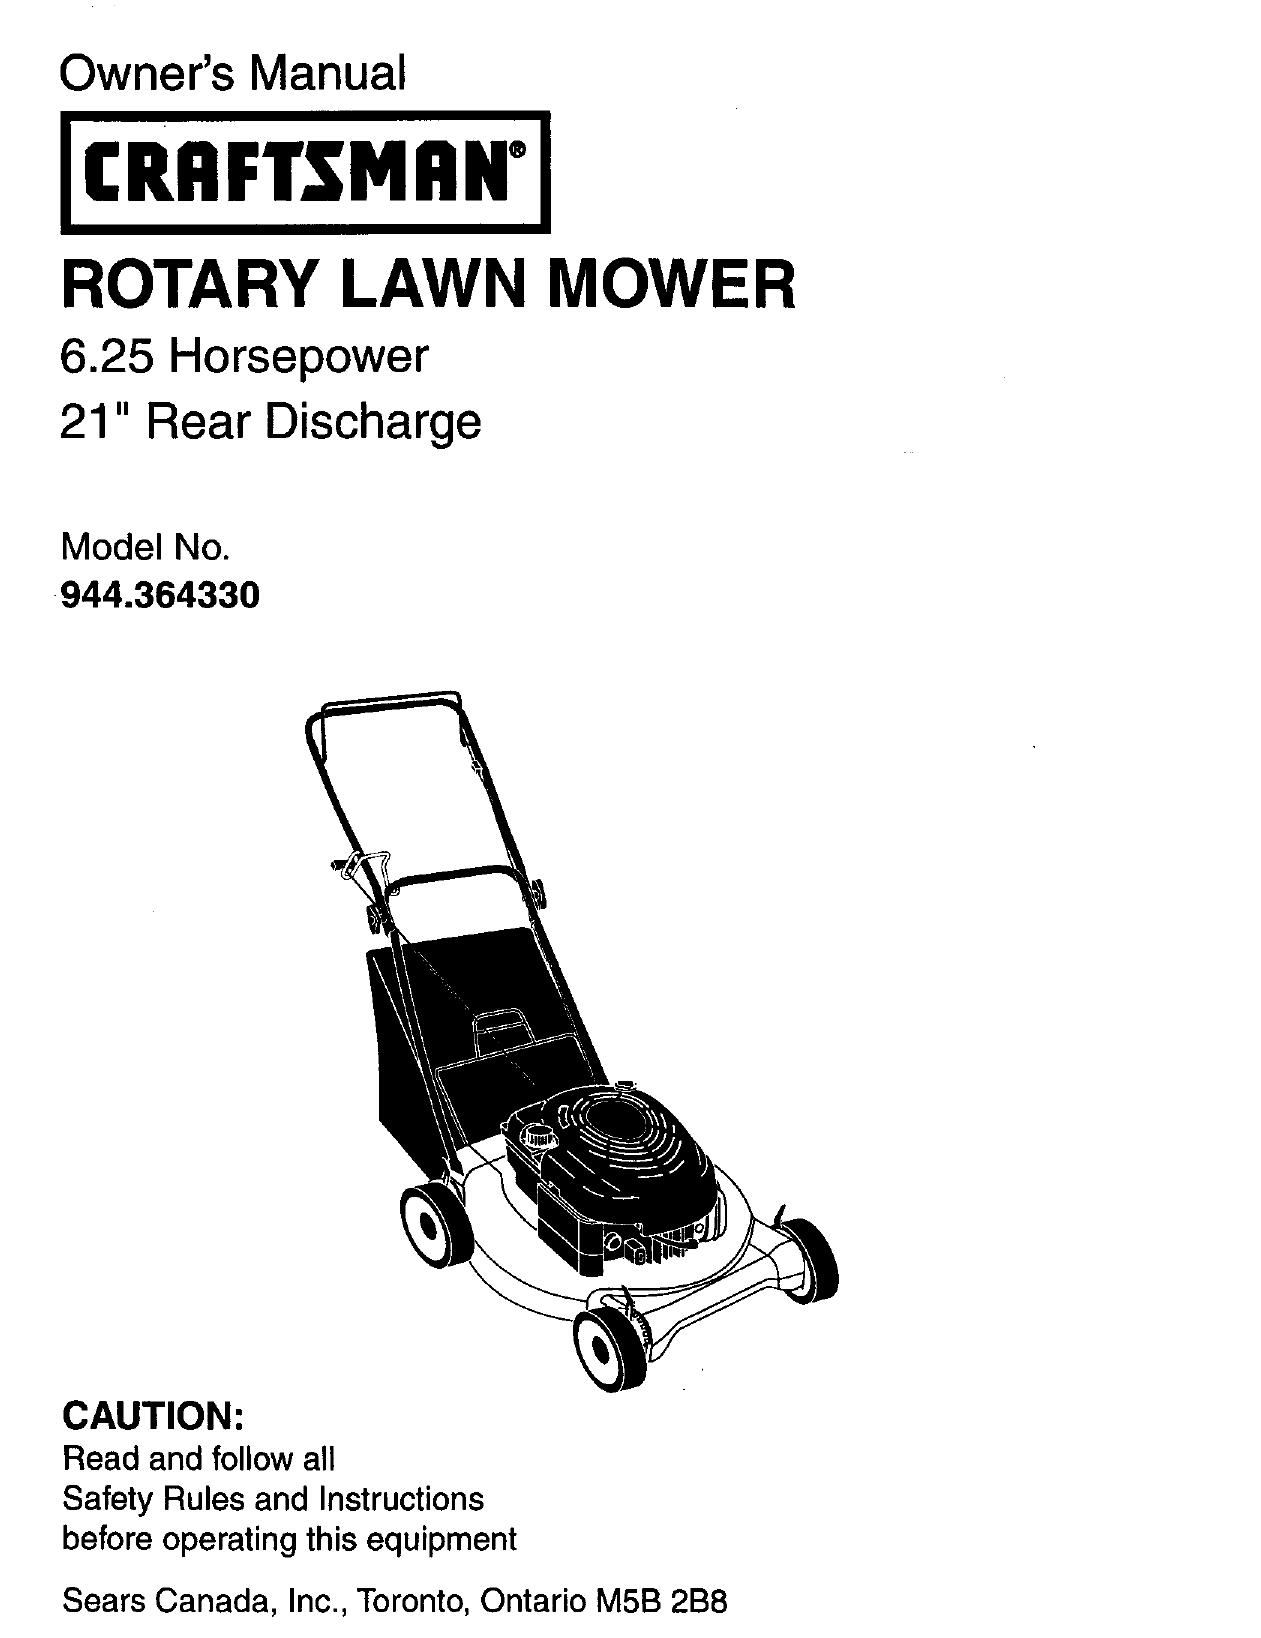 craftsman 944 364330 owner s manual rh manualzilla com Craftsman 6.75 Lawn Mower Craftsman Riding Lawn Mower Diagrams